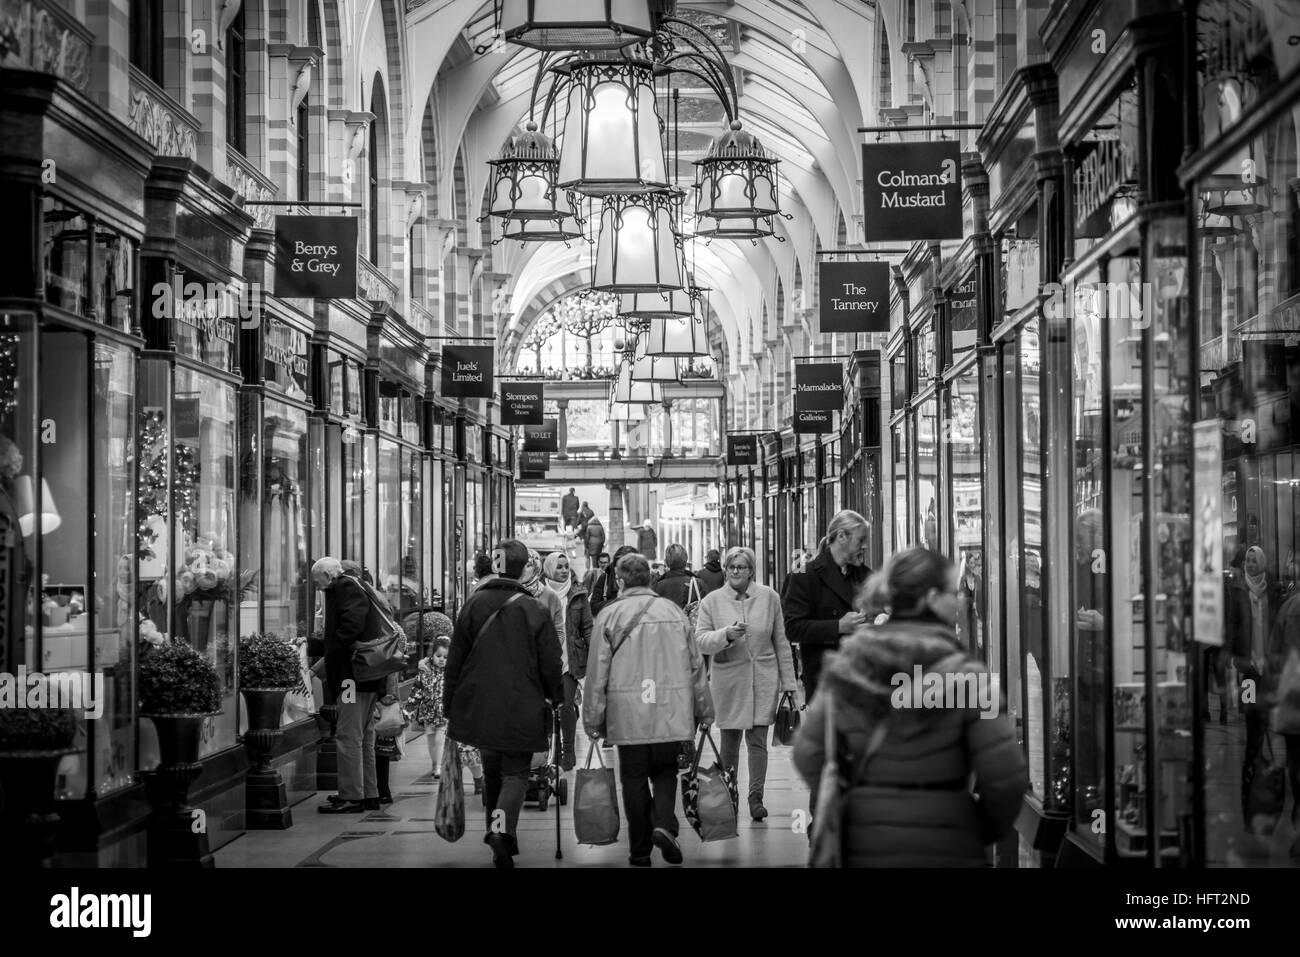 Busy shopping at the Royal Arcade - Stock Image